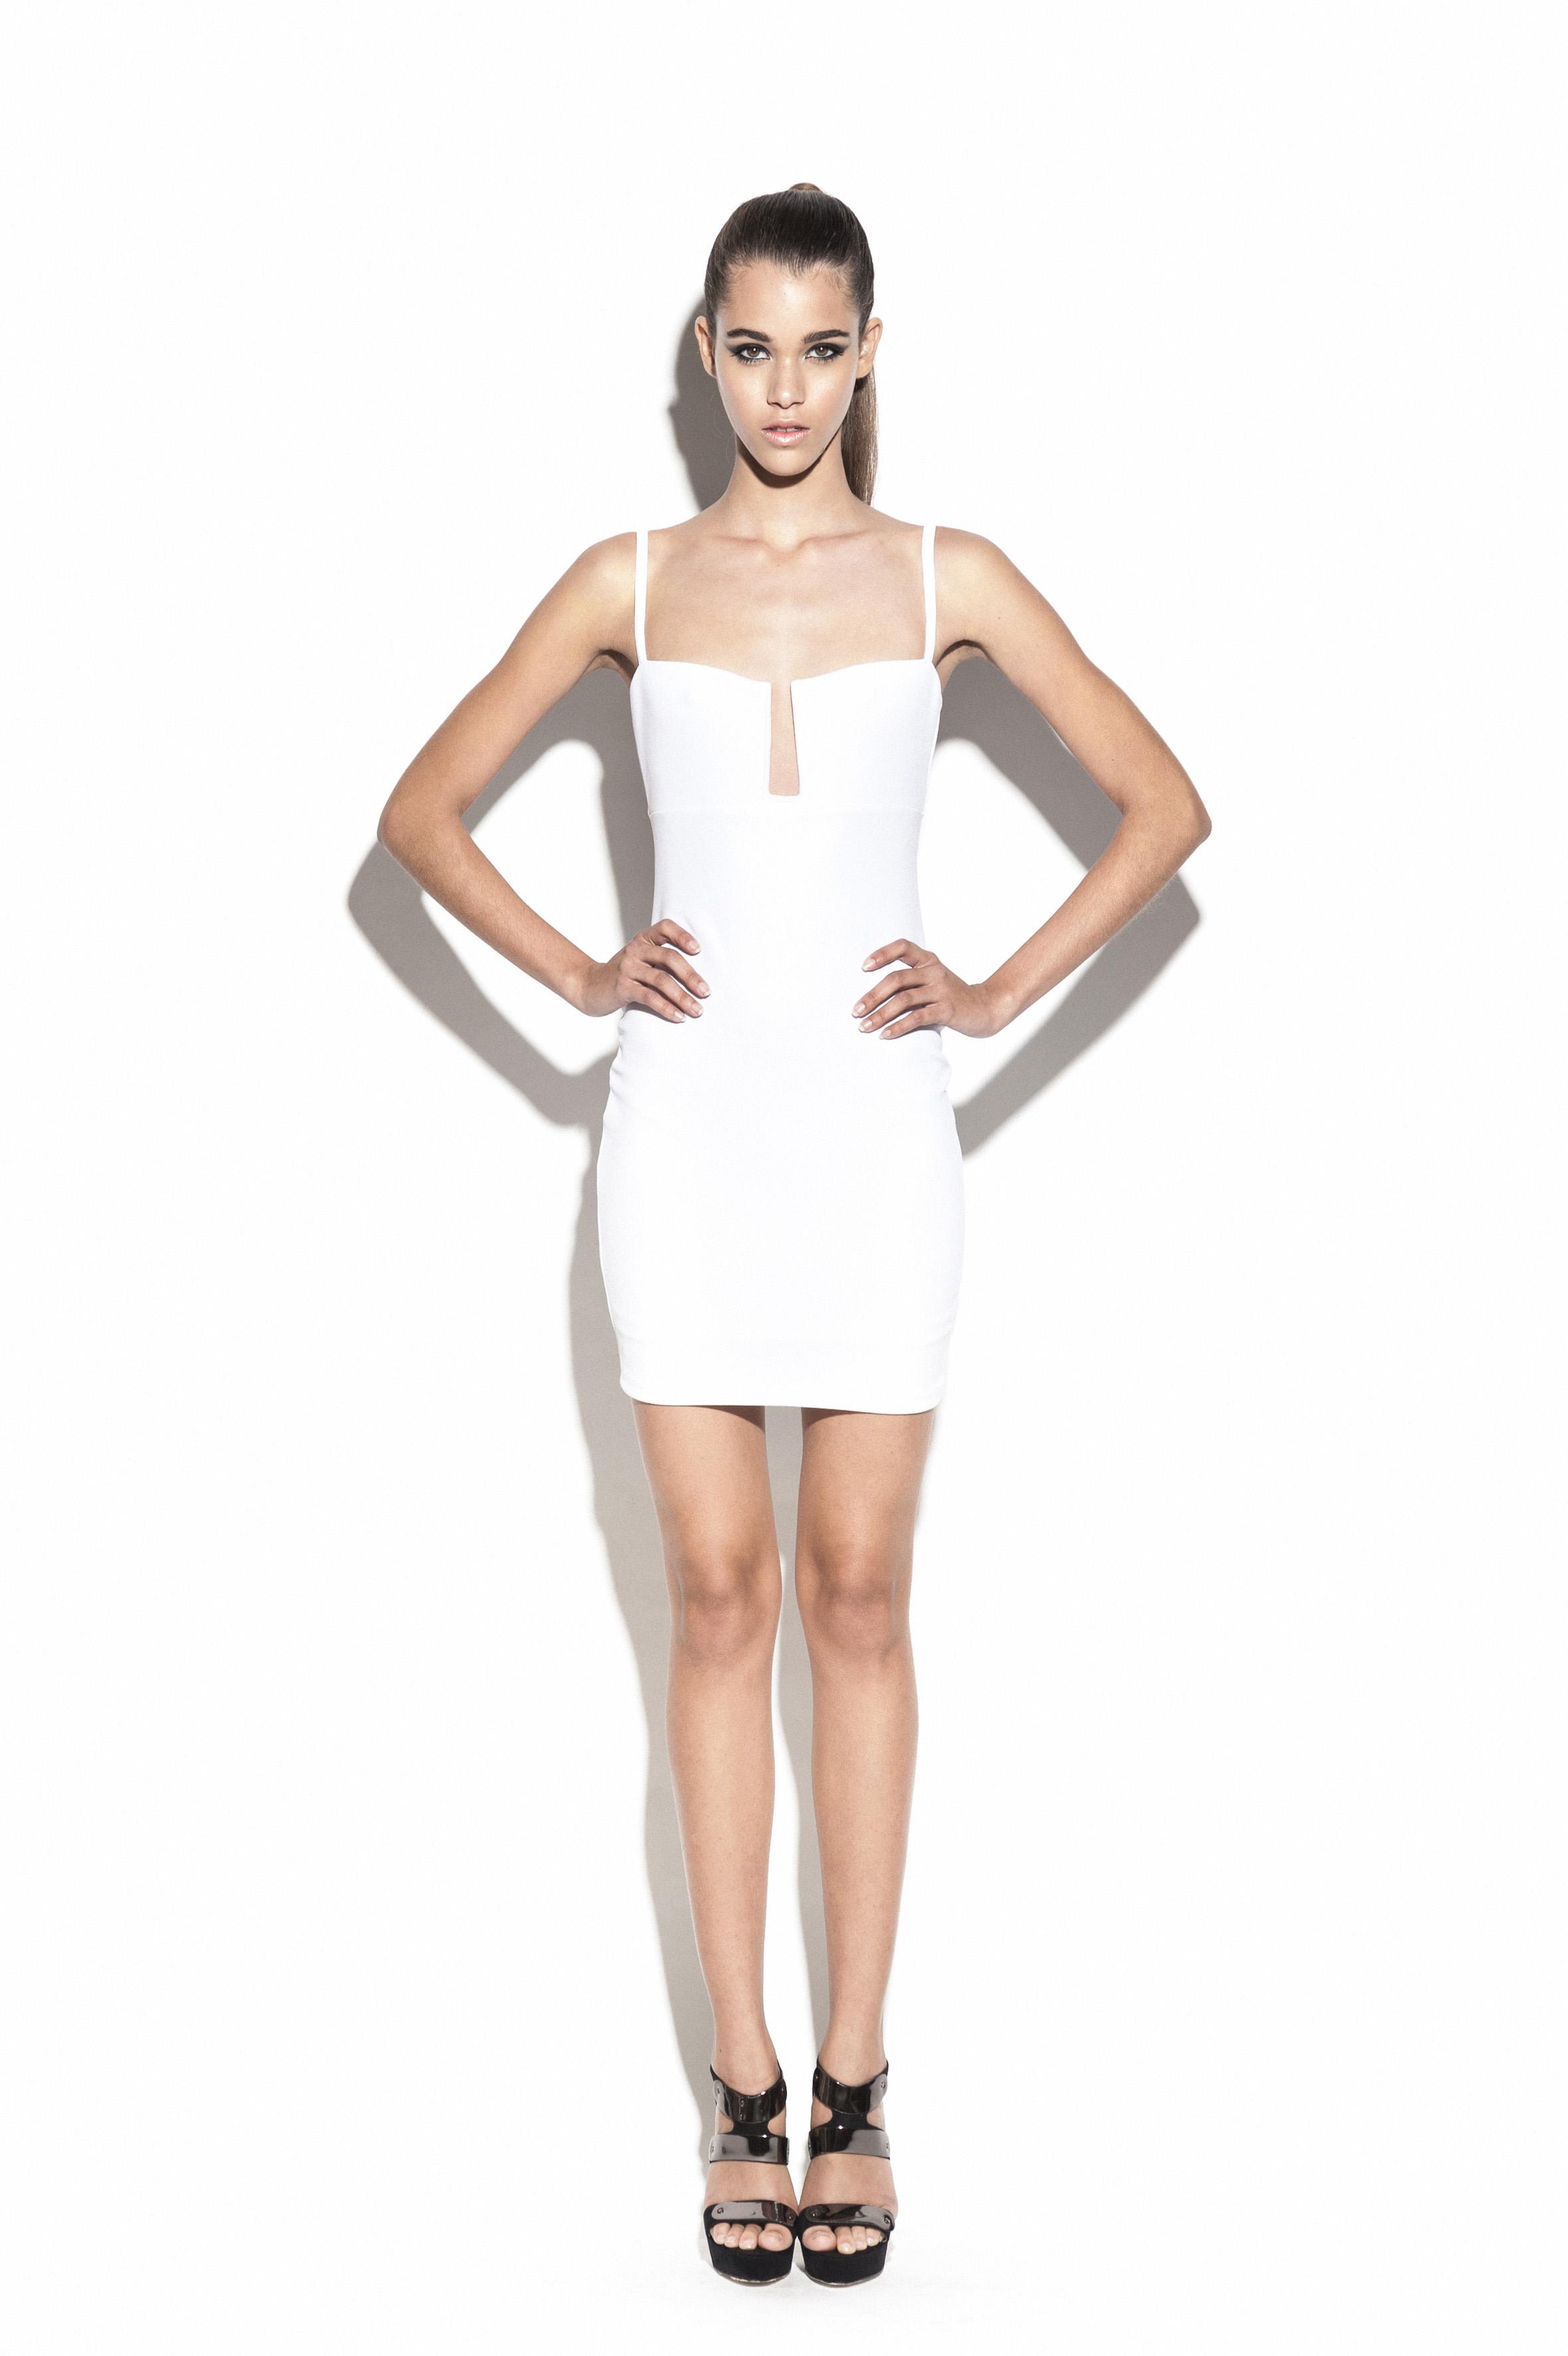 White Stadium Bustier Dress : Buy Designer Dresses Online at Nookie